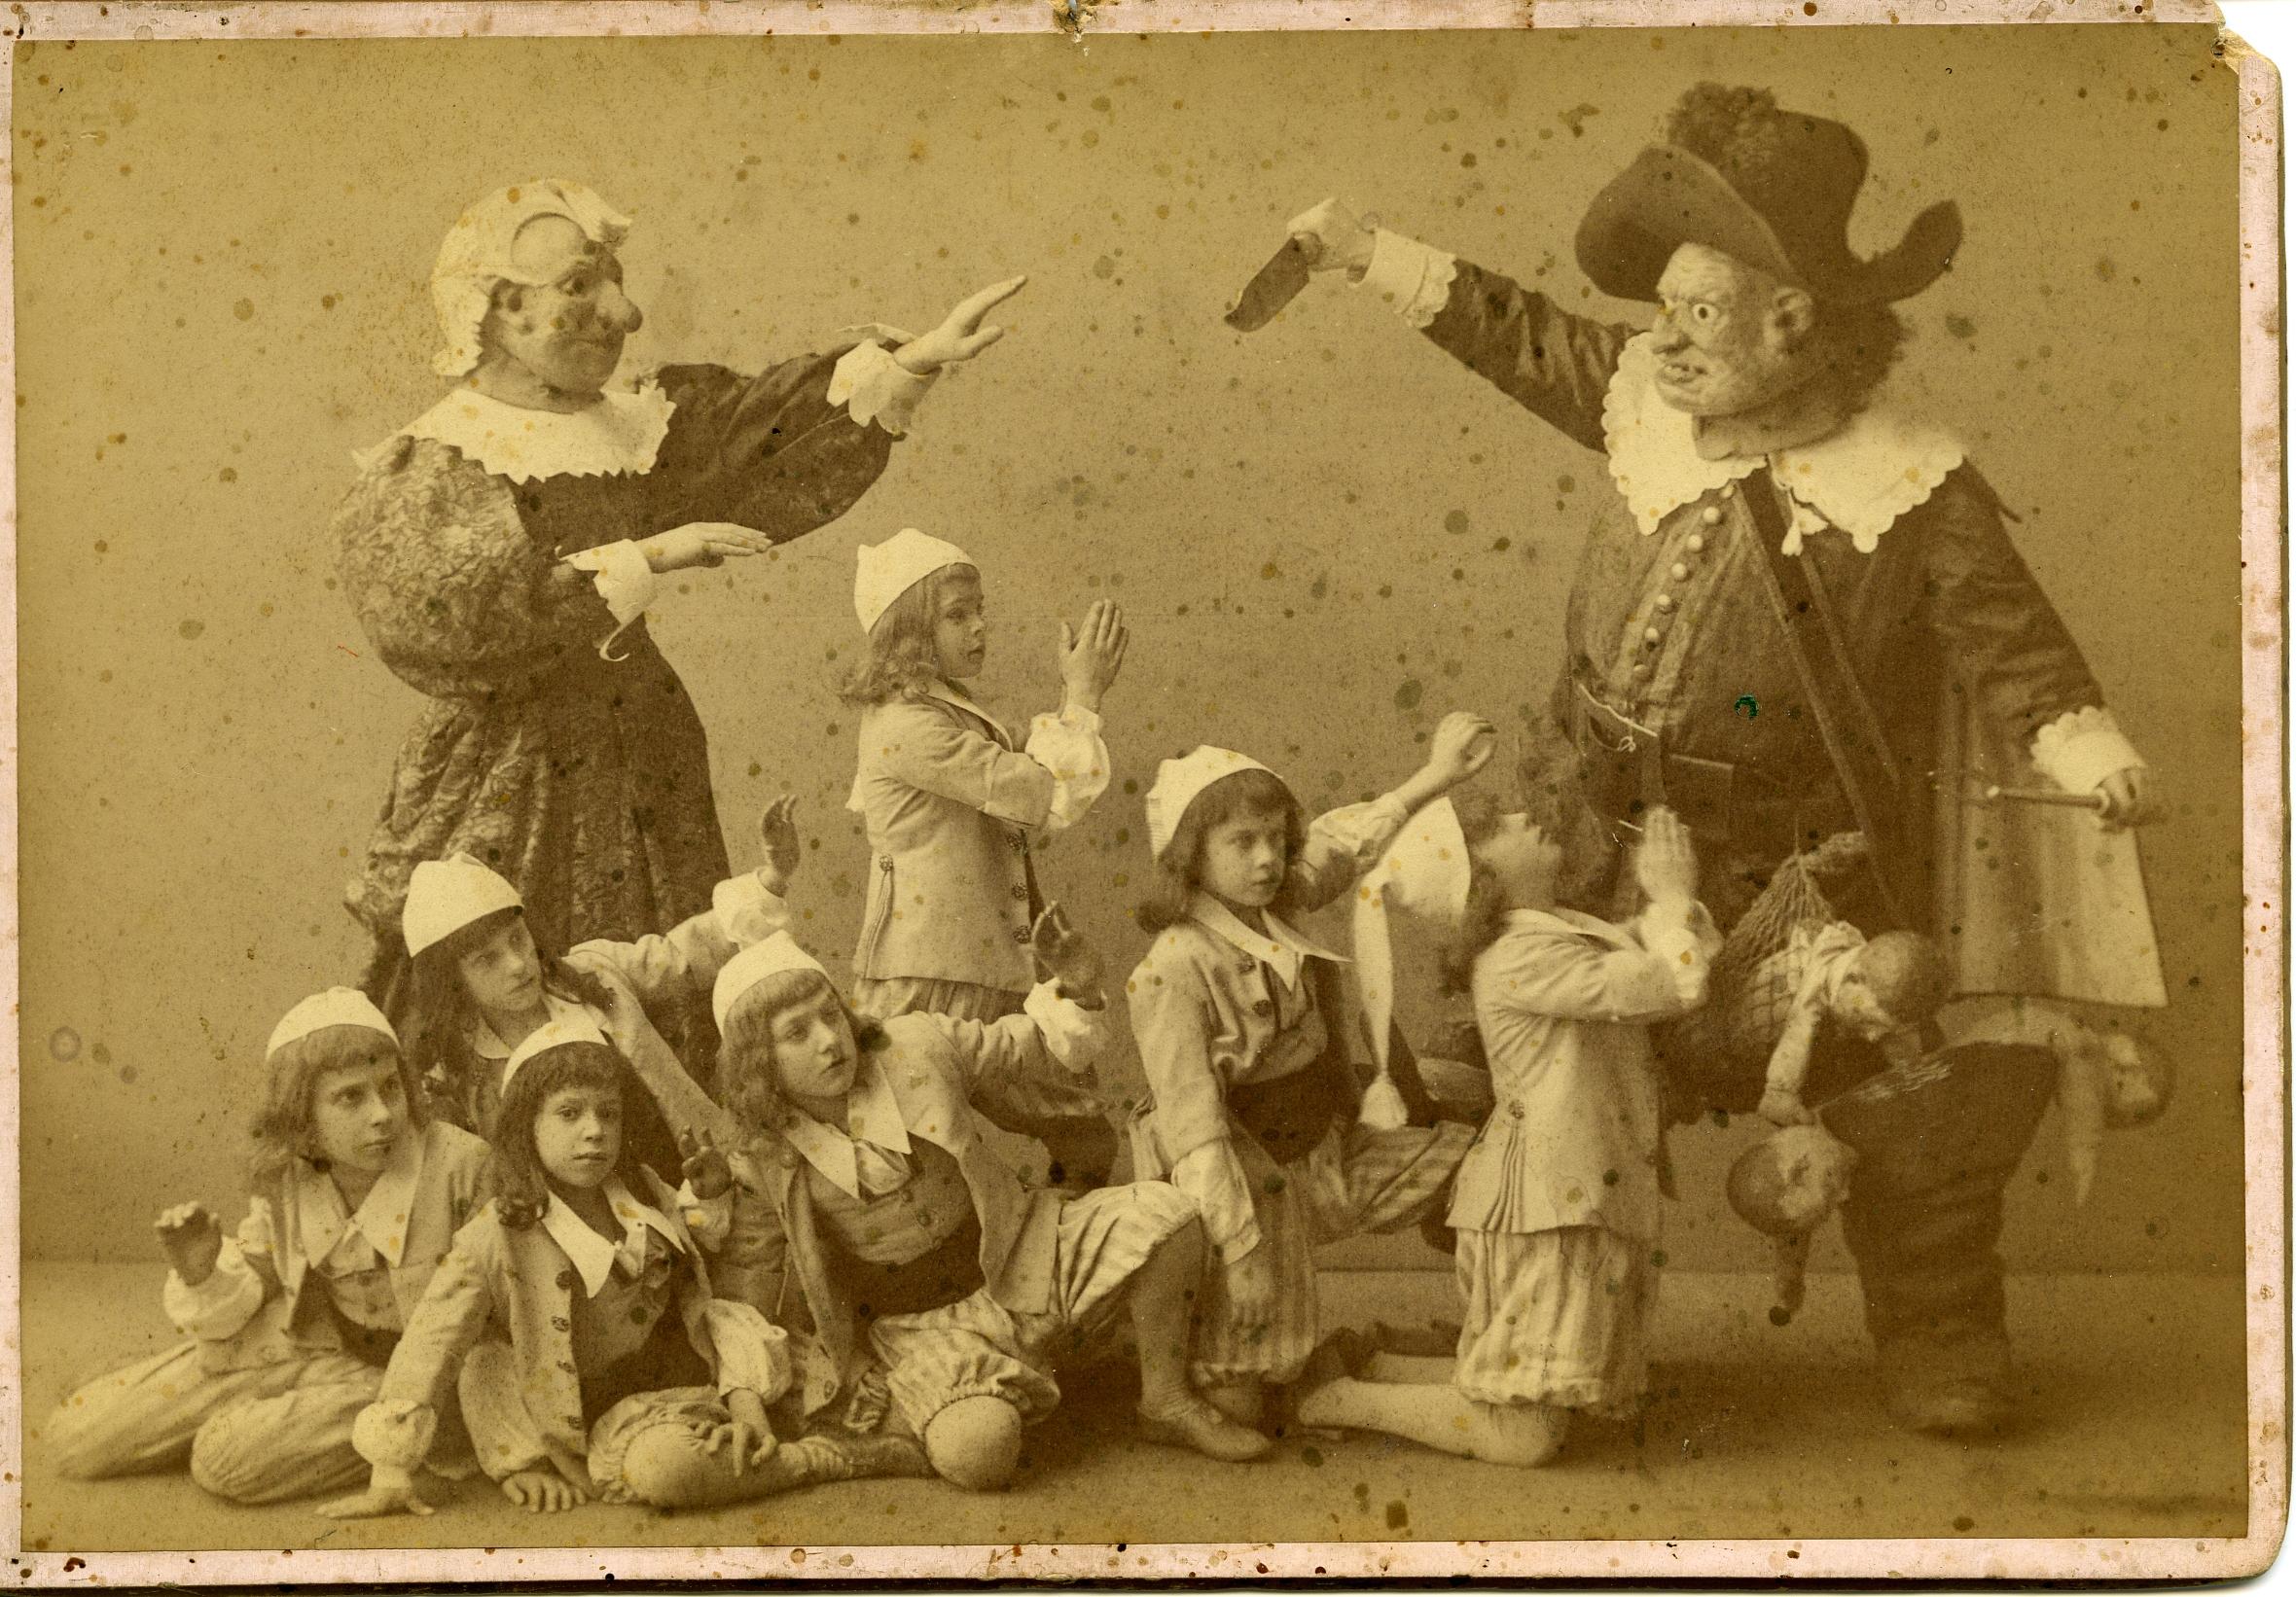 """Hop-o'-My-Thumb"", 1890 original cast of The Sleeping beauty"